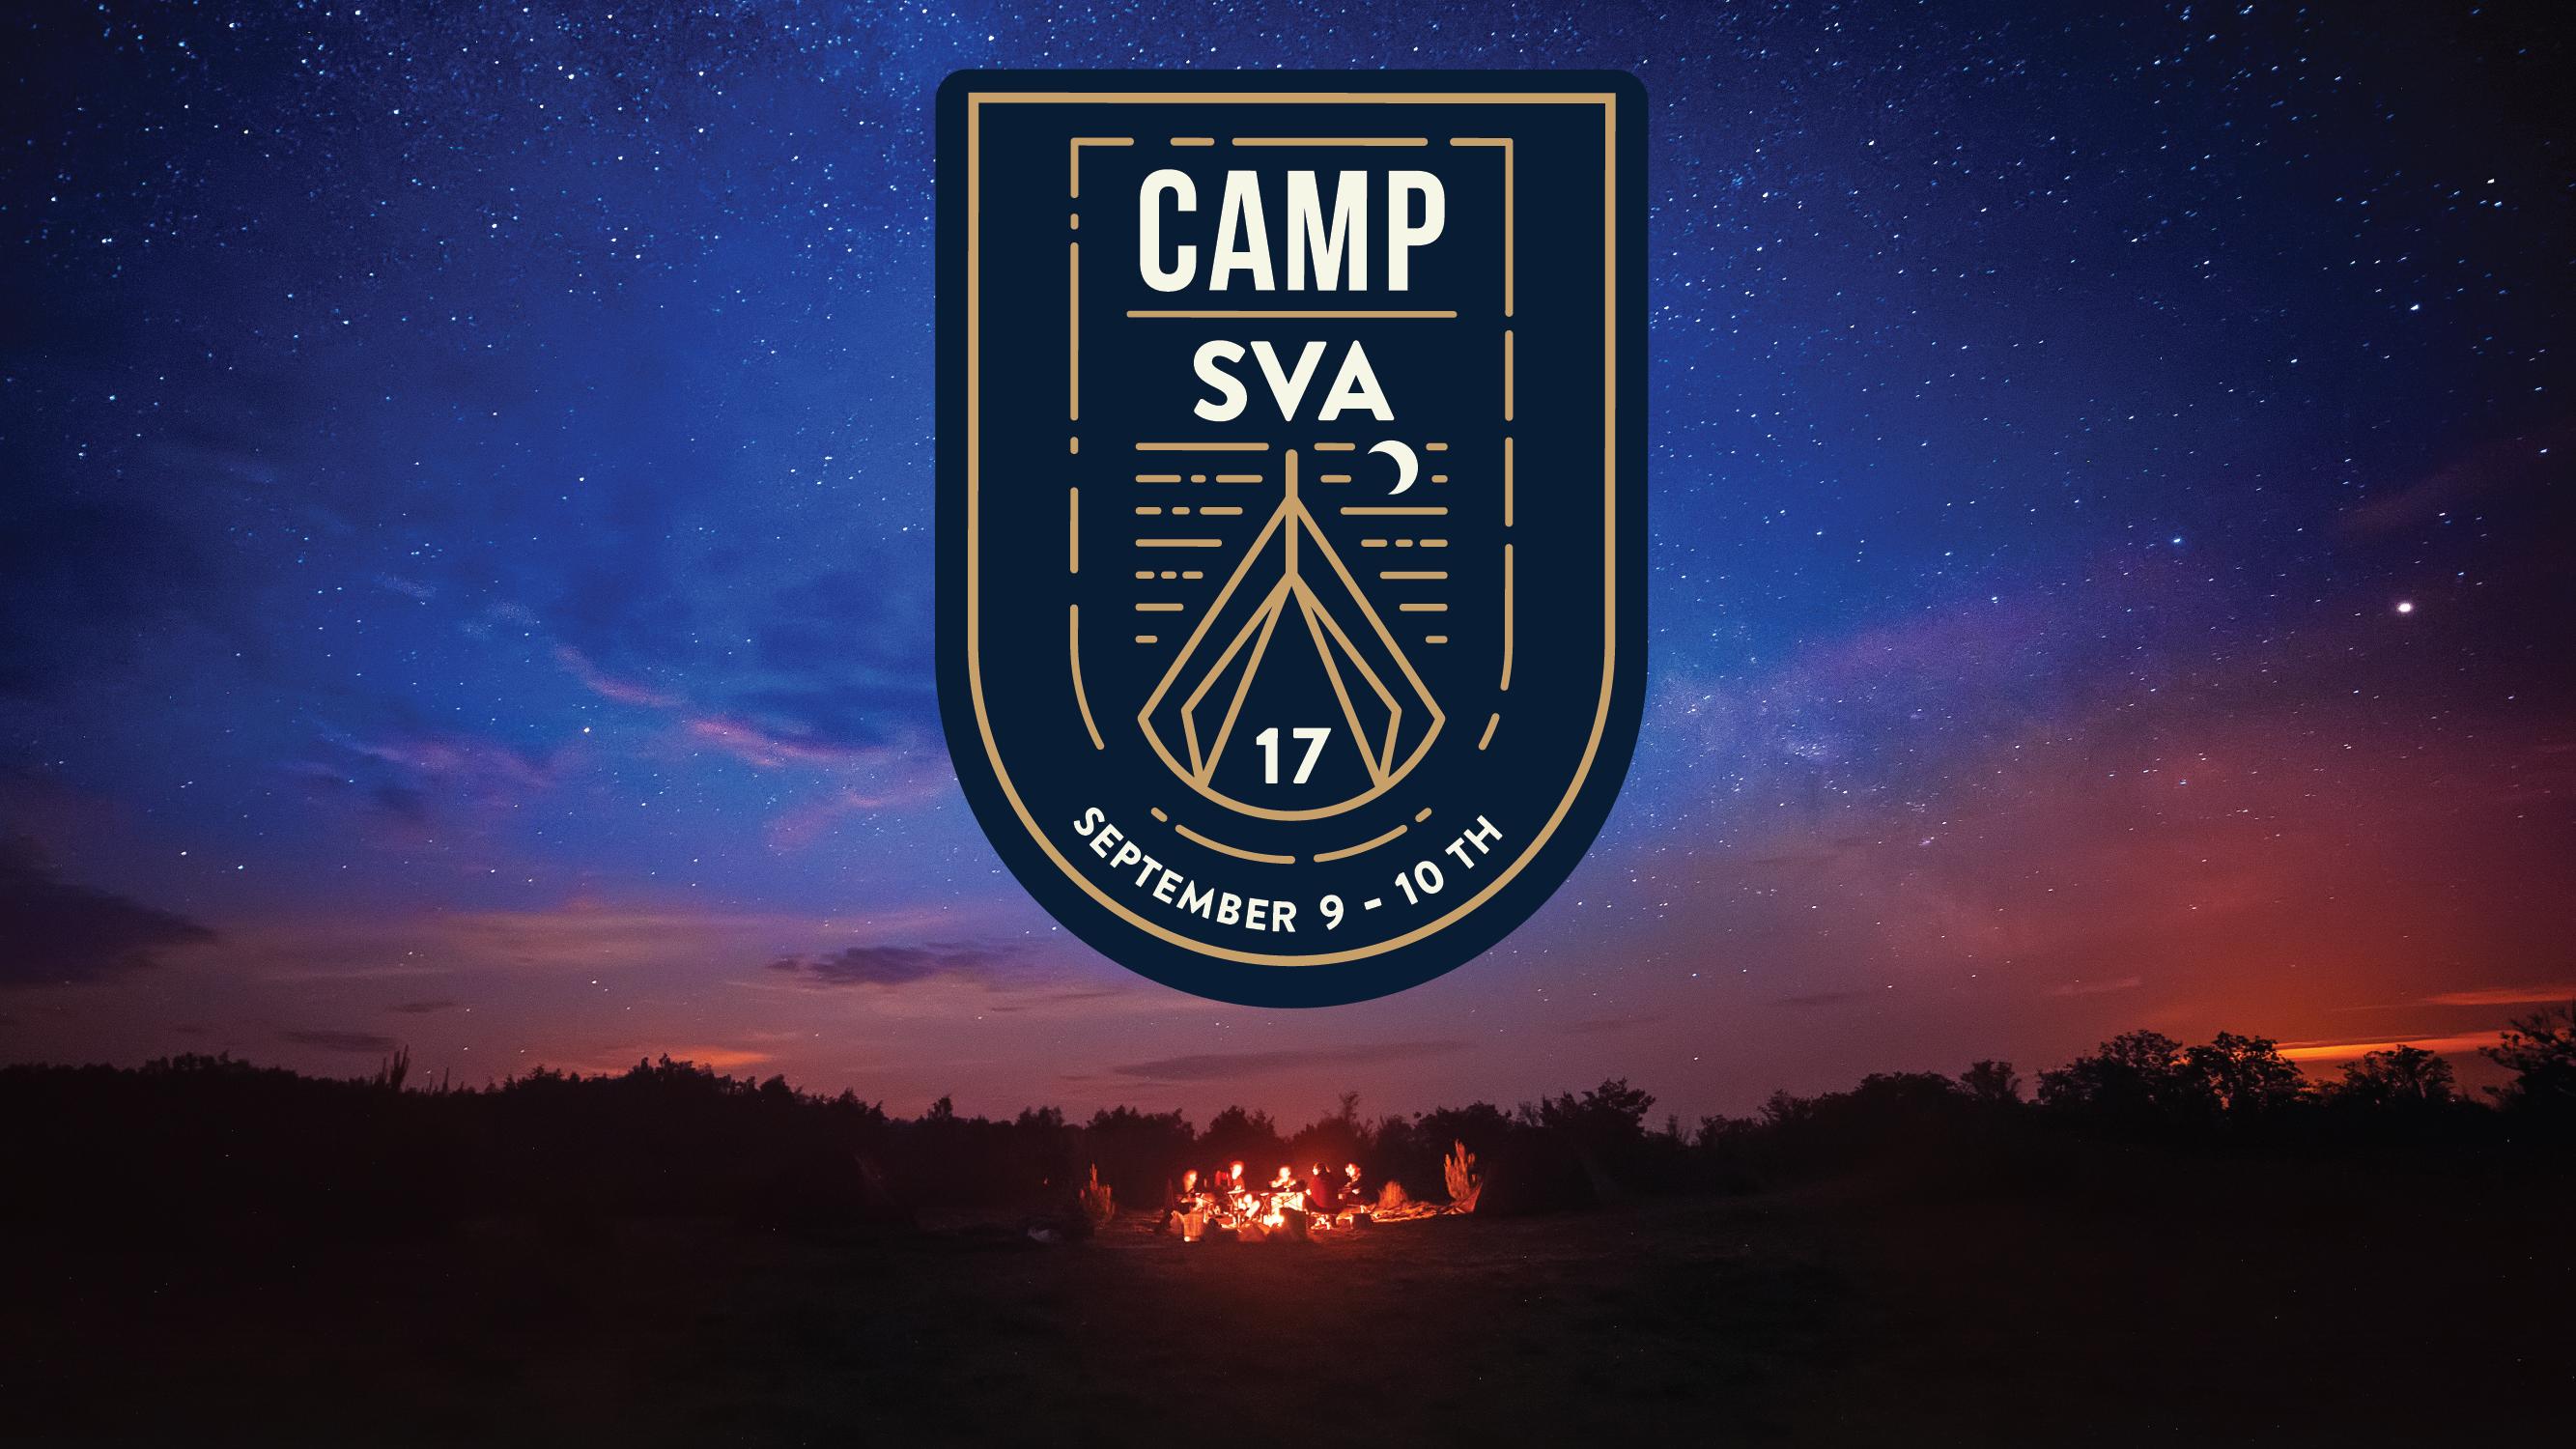 Camp sva dig sz finals regg 411 slide